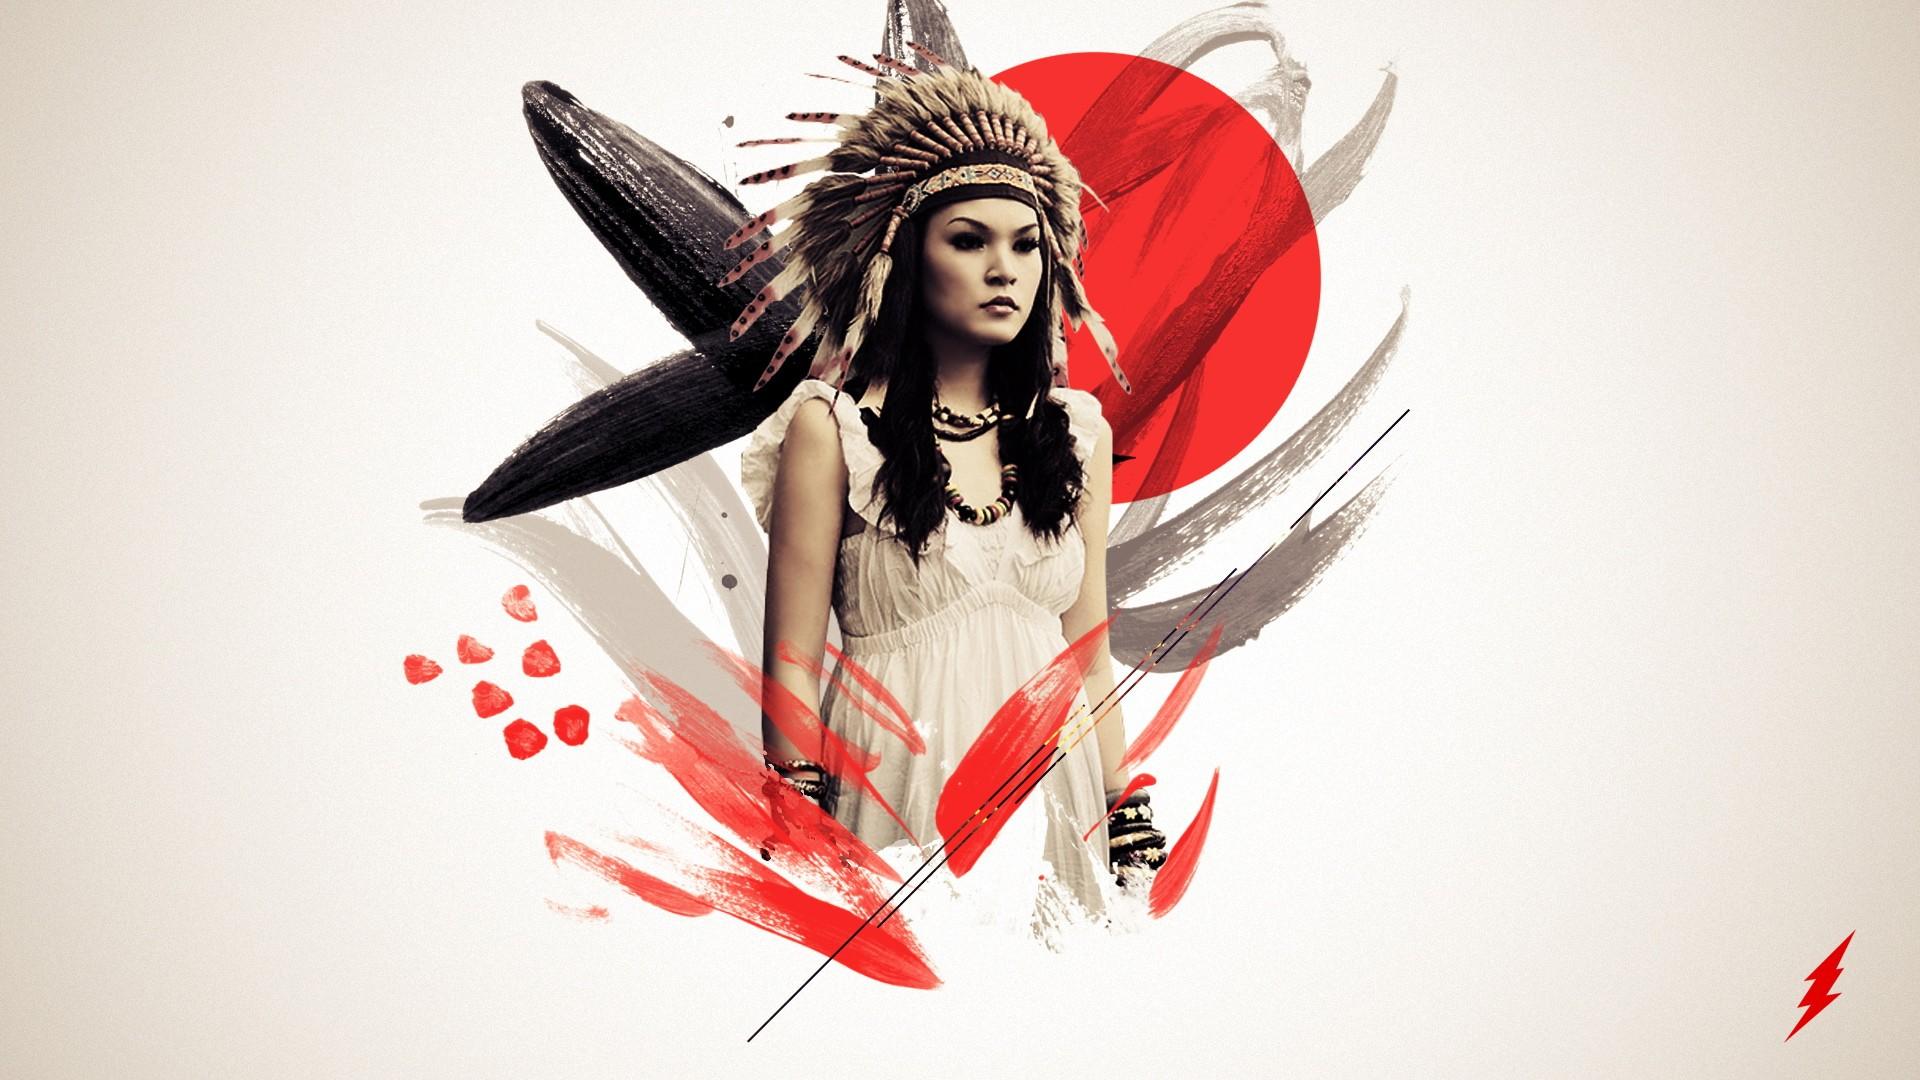 Native american full hd wallpaper and background image 1920x1080 artistic native american wallpaper voltagebd Choice Image